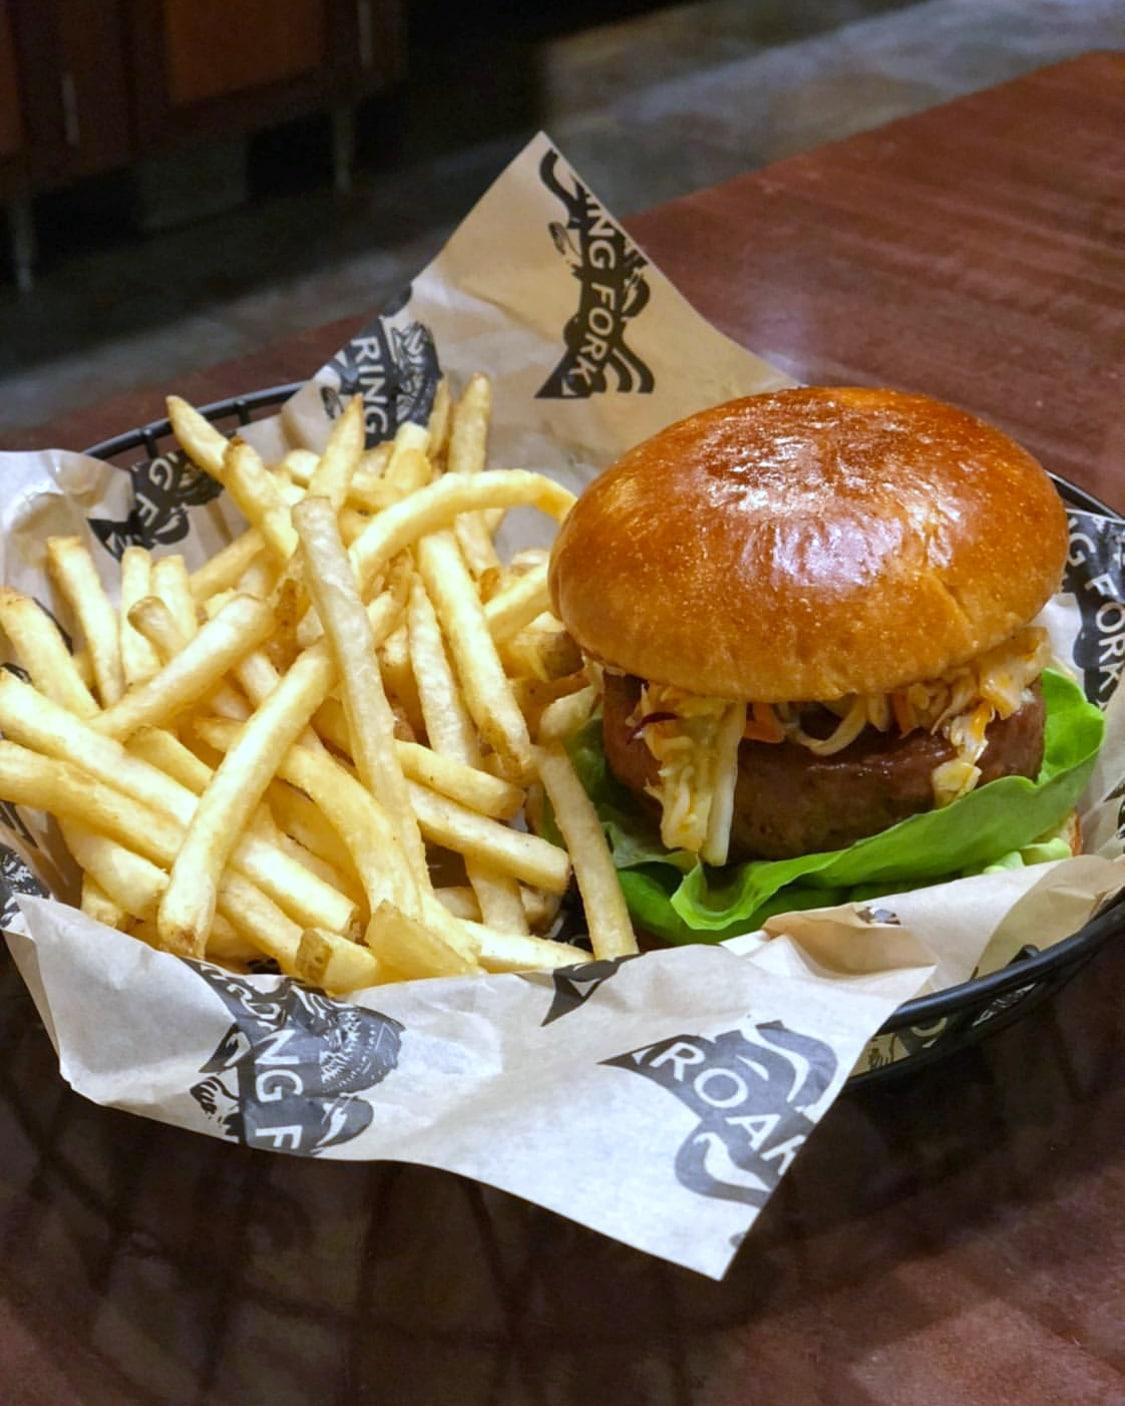 Vegan Zesty Slaw Burger at Roaring Fork in Disney's Wilderness Lodge at Walt Disney World